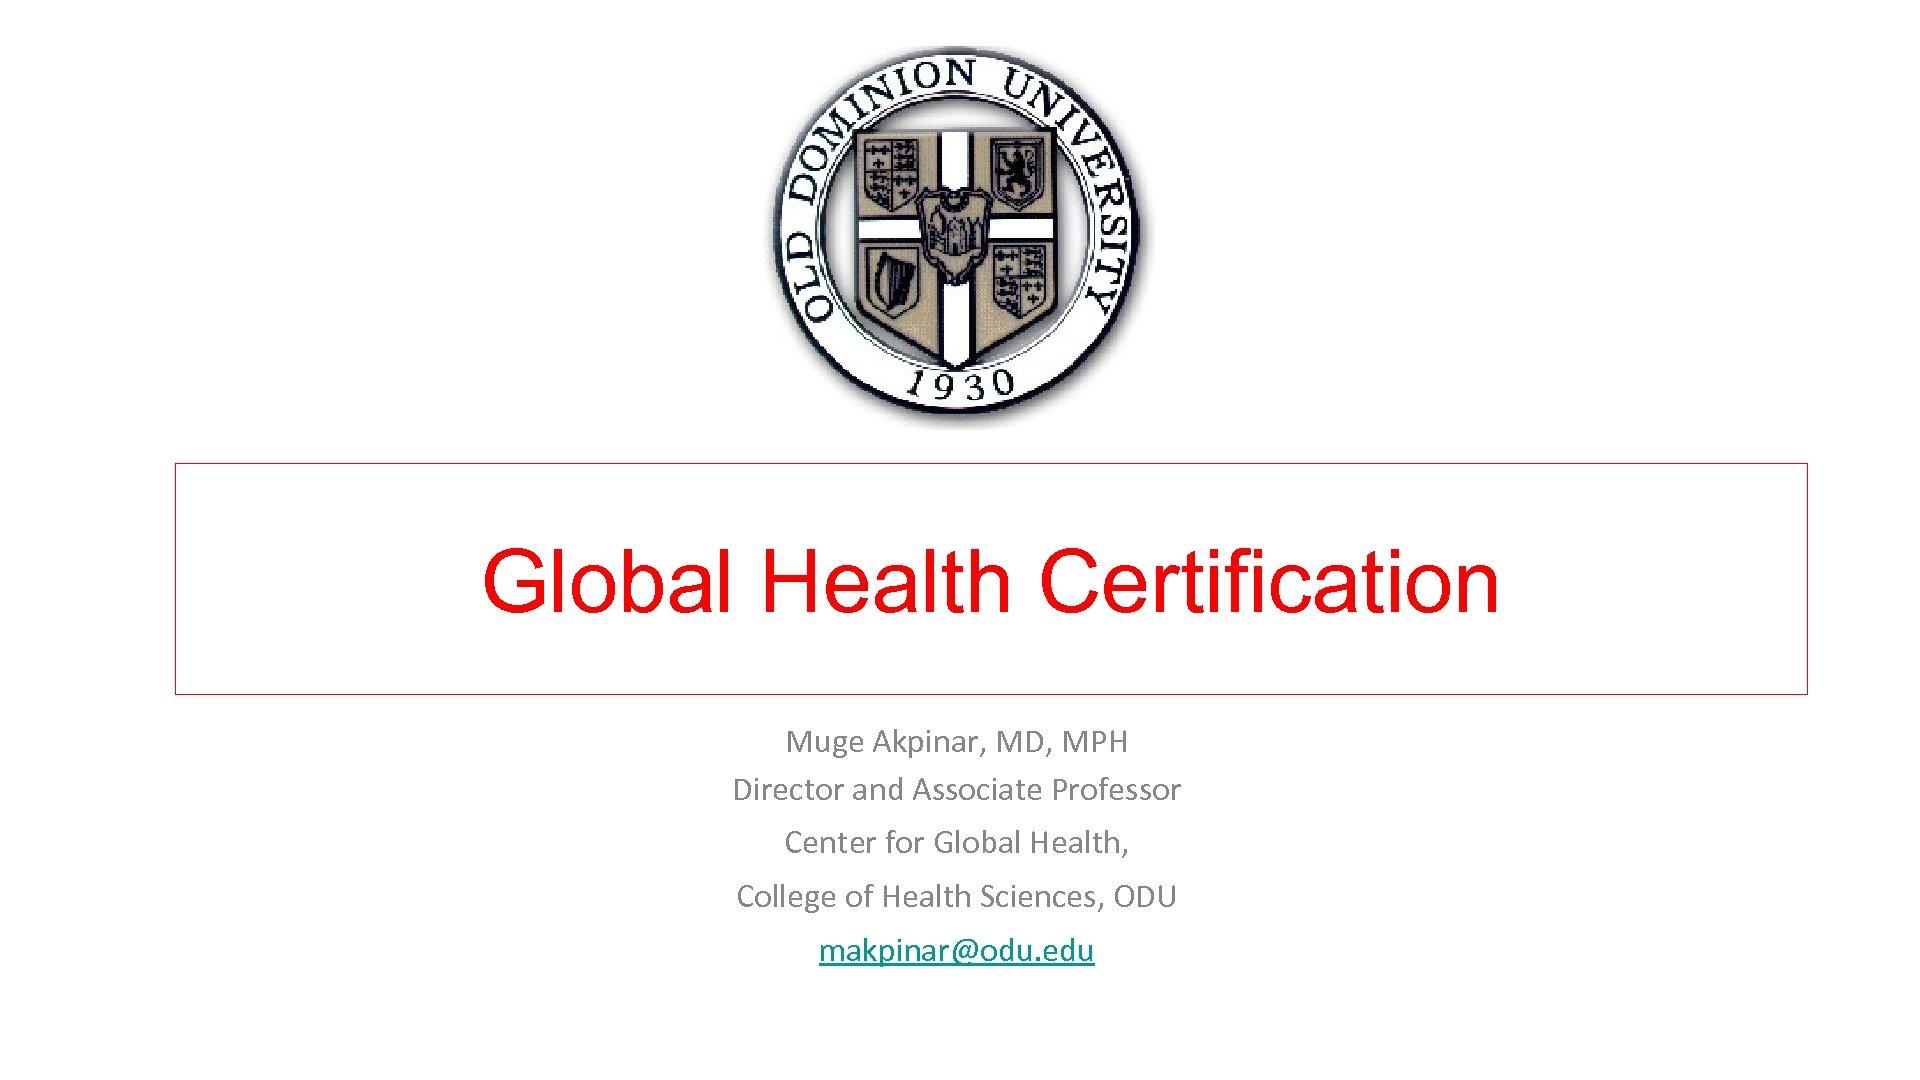 Global Health Certification Muge Akpinar, MD, MPH Director and Associate Professor Center for Global